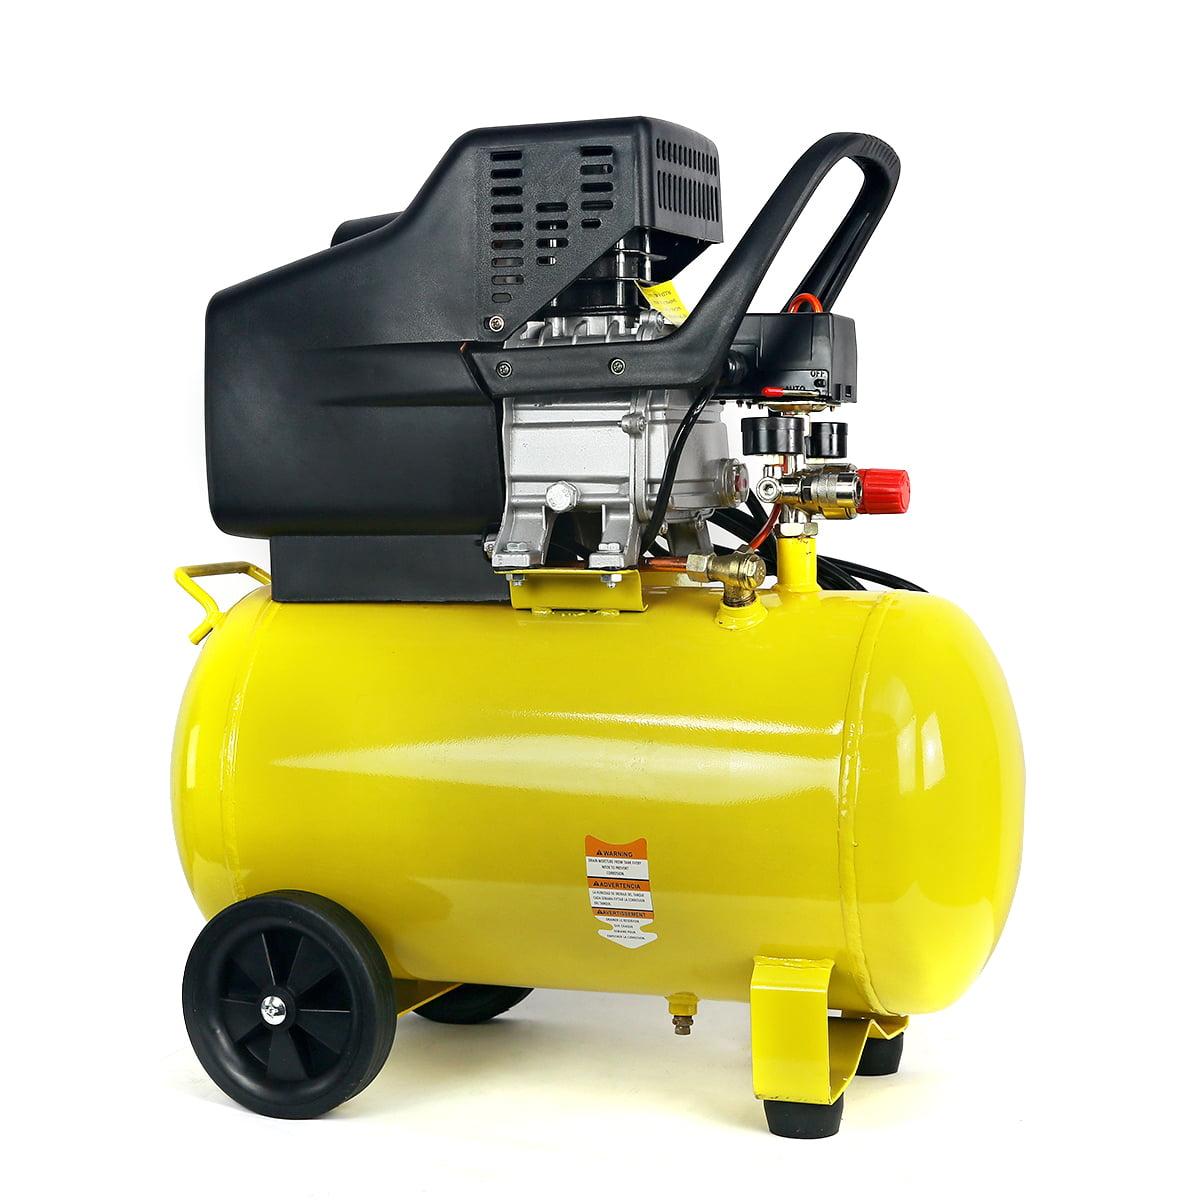 Stark Portable Quiet Air Compressor 10-Gallon Tank 3.5HP Air Compressor Ultra Quiet Compressor w  Wheel by